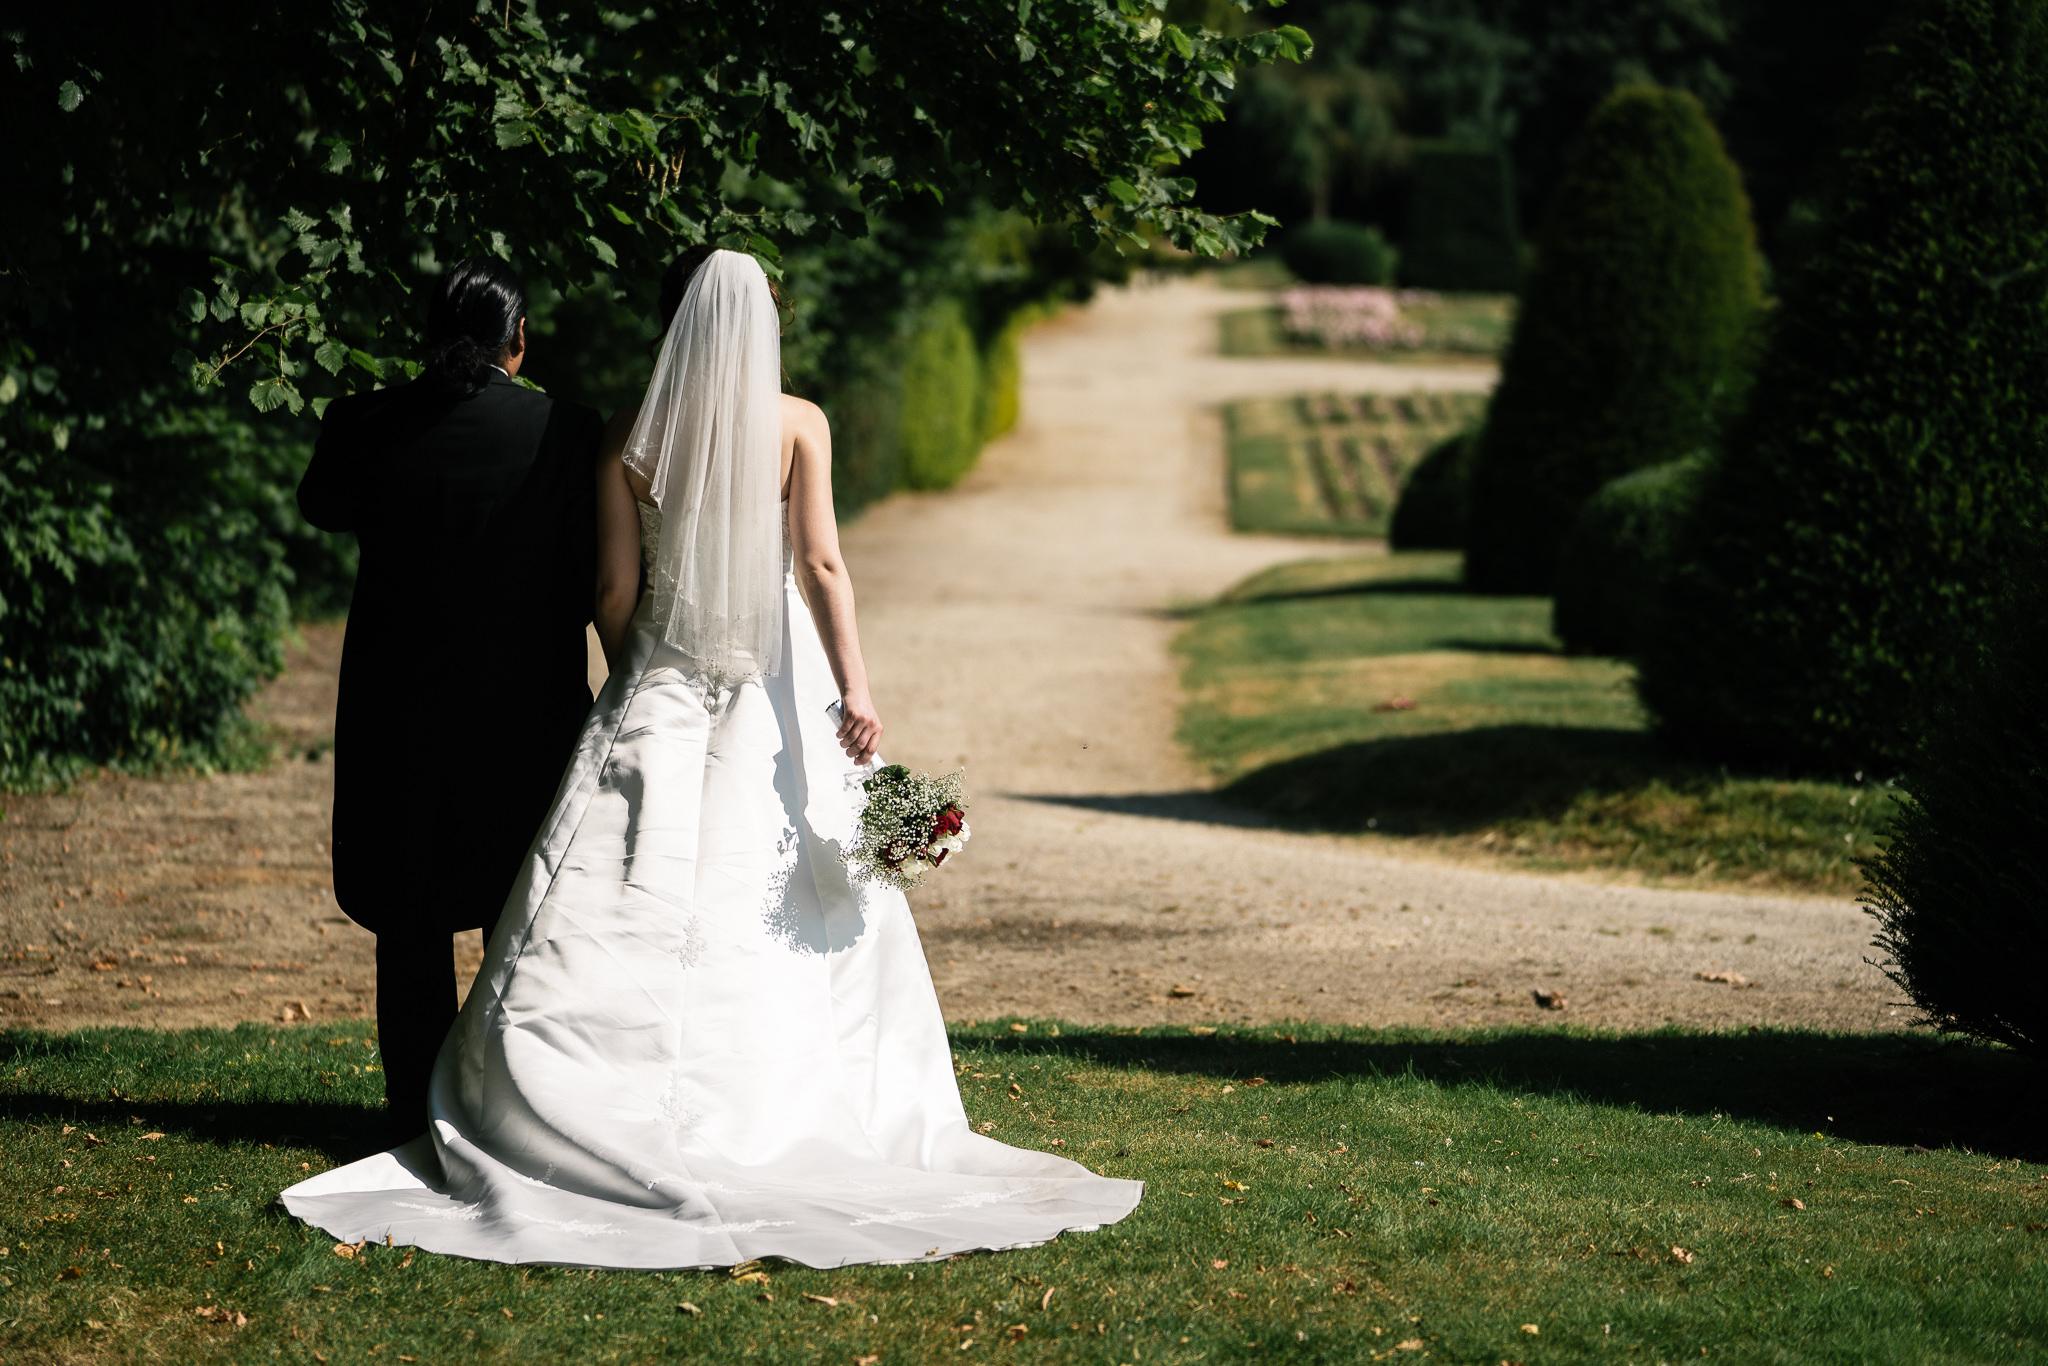 Wedding-Ana&Jeysson-30062018-reduced-165.jpg